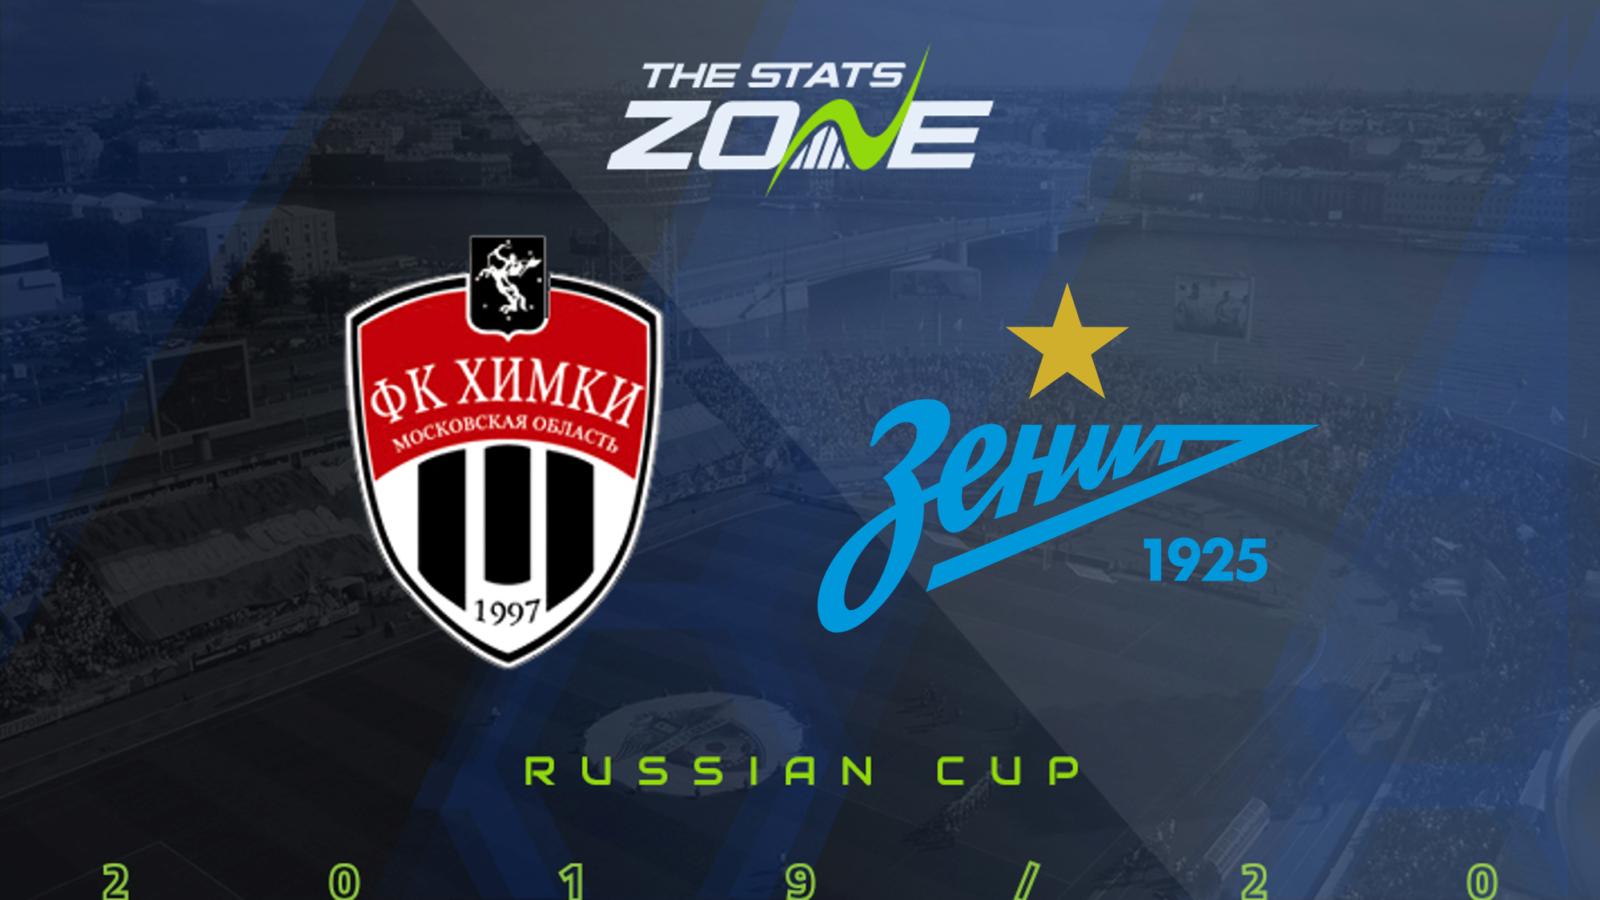 2019 20 Russian Cup Final Khimki Vs Zenit Preview Prediction The Stats Zone